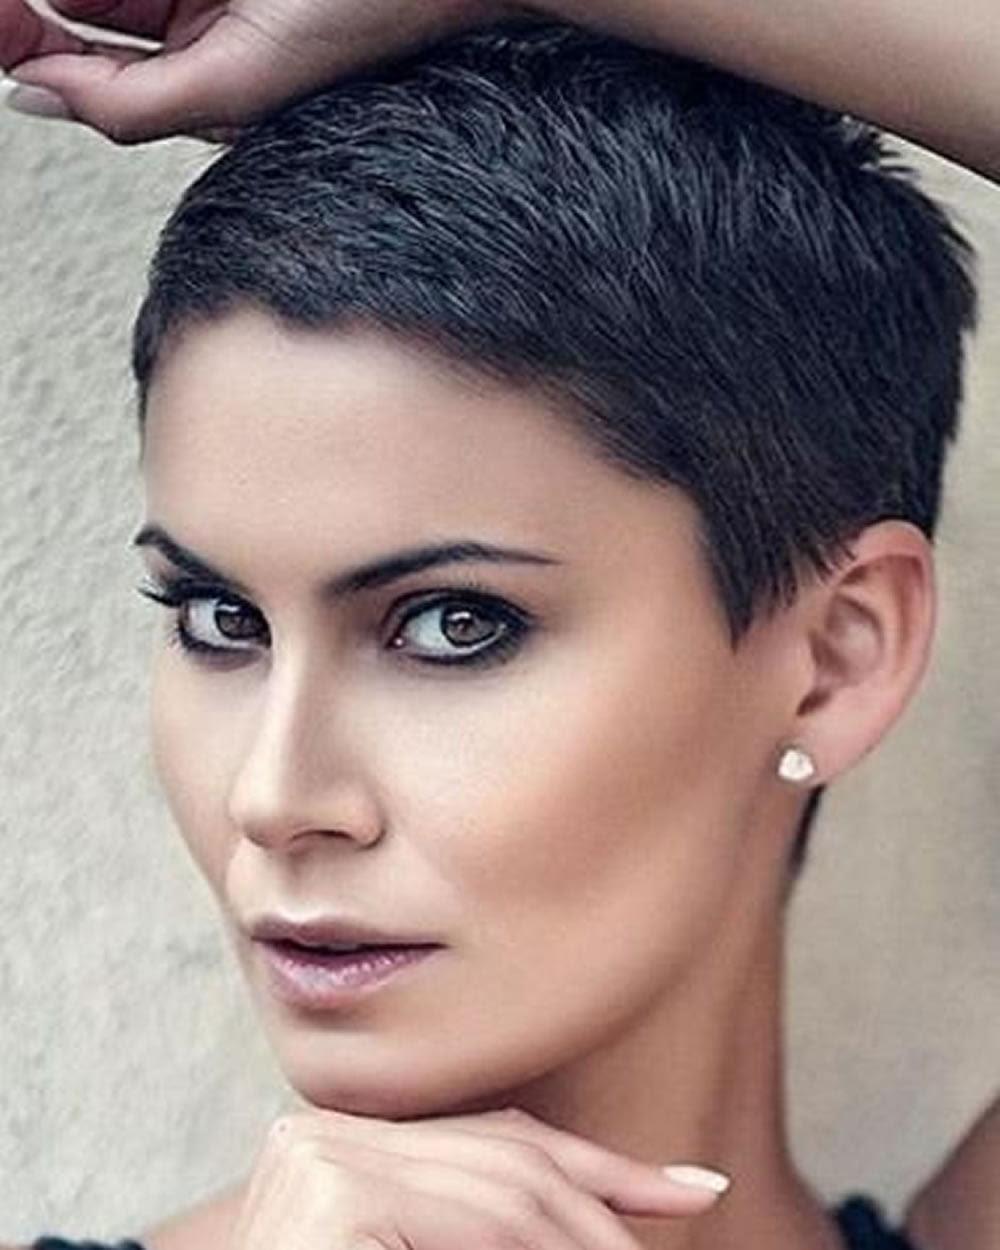 Super Very Short iPixiei iHaircutsi Hair Colors for 2020